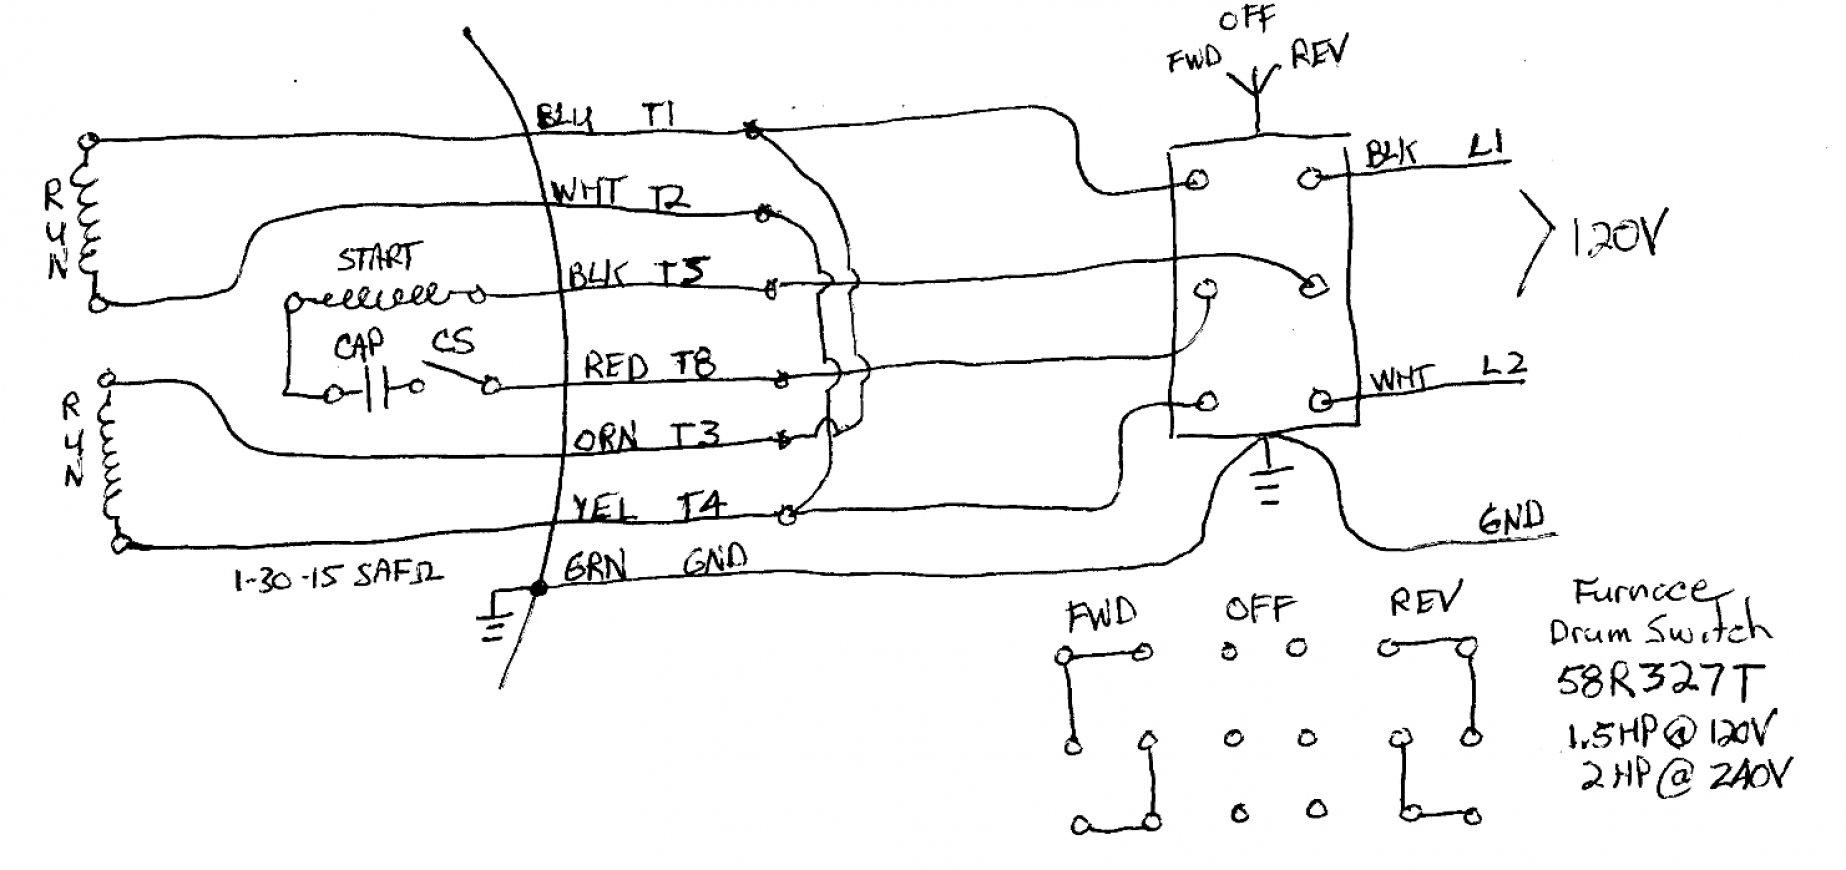 Century Electric Motors Wiring Diagram | Wiring Diagram - Century Electric Motor Wiring Diagram